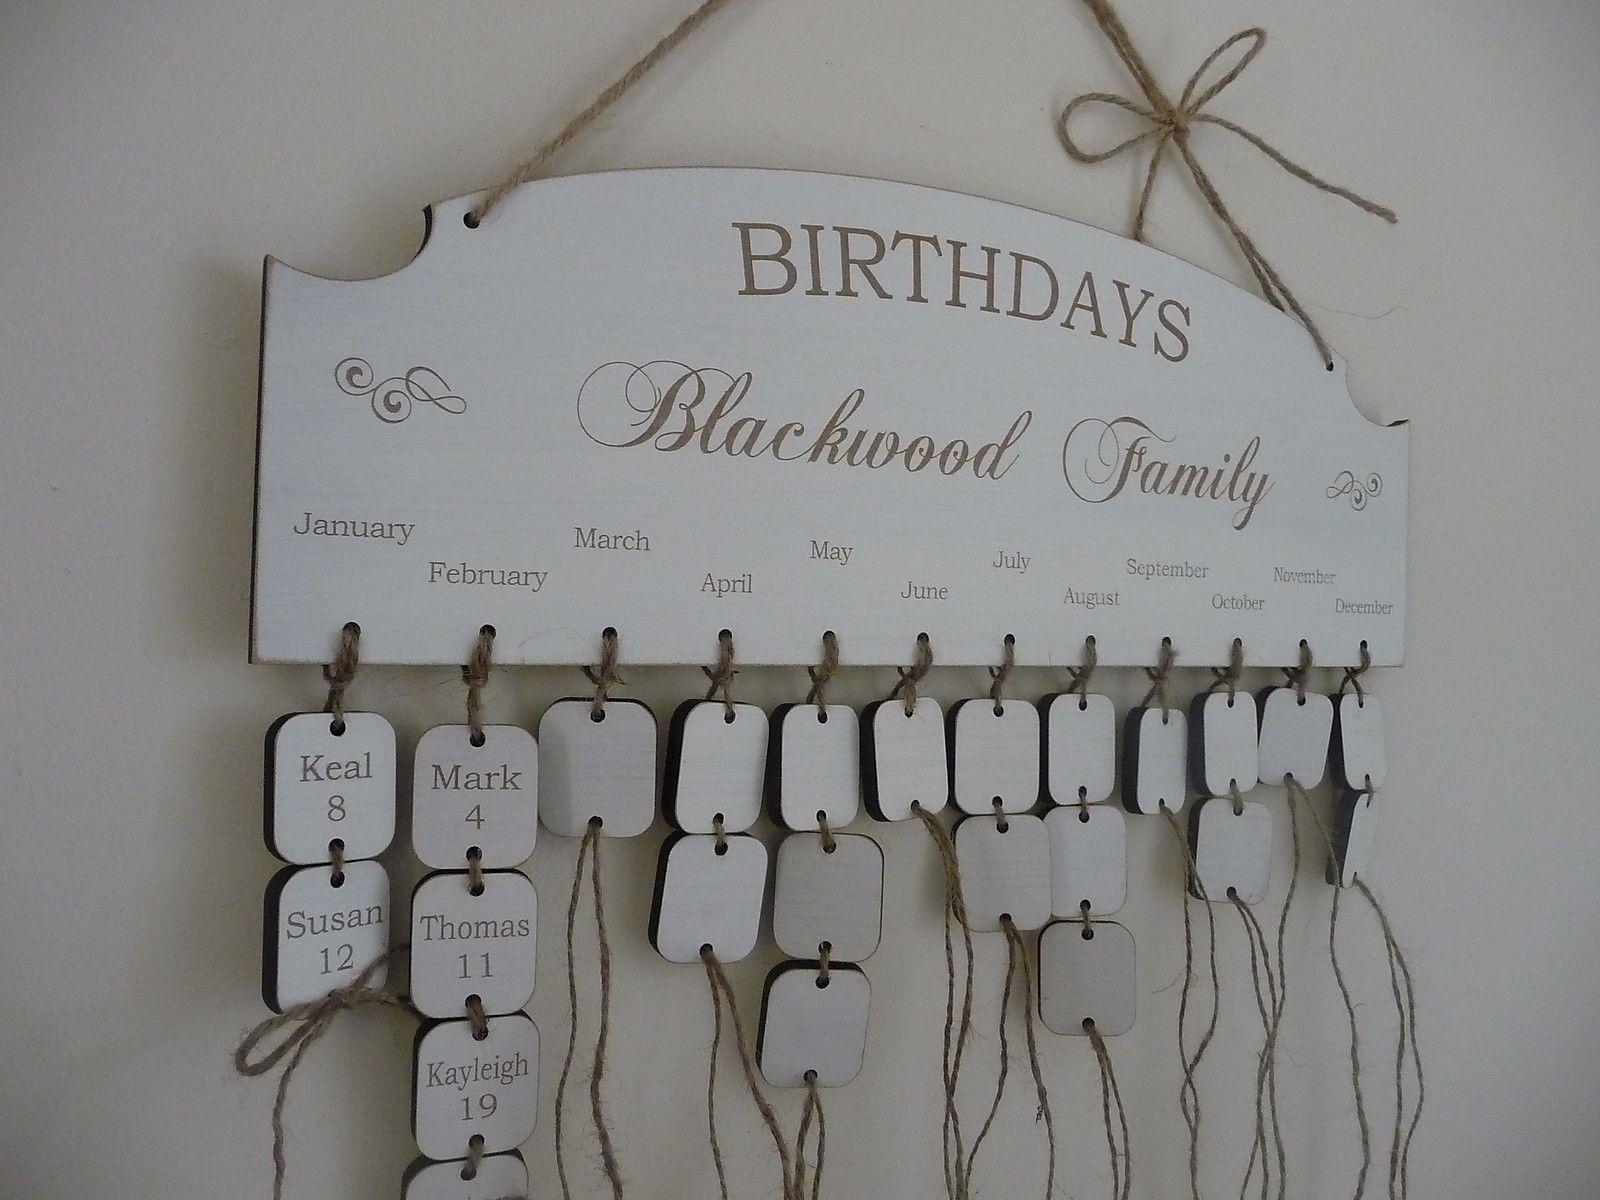 MY BIBY Family Friends Birthday Calendar Wood Wall Hanging DIY Wooden Reminder